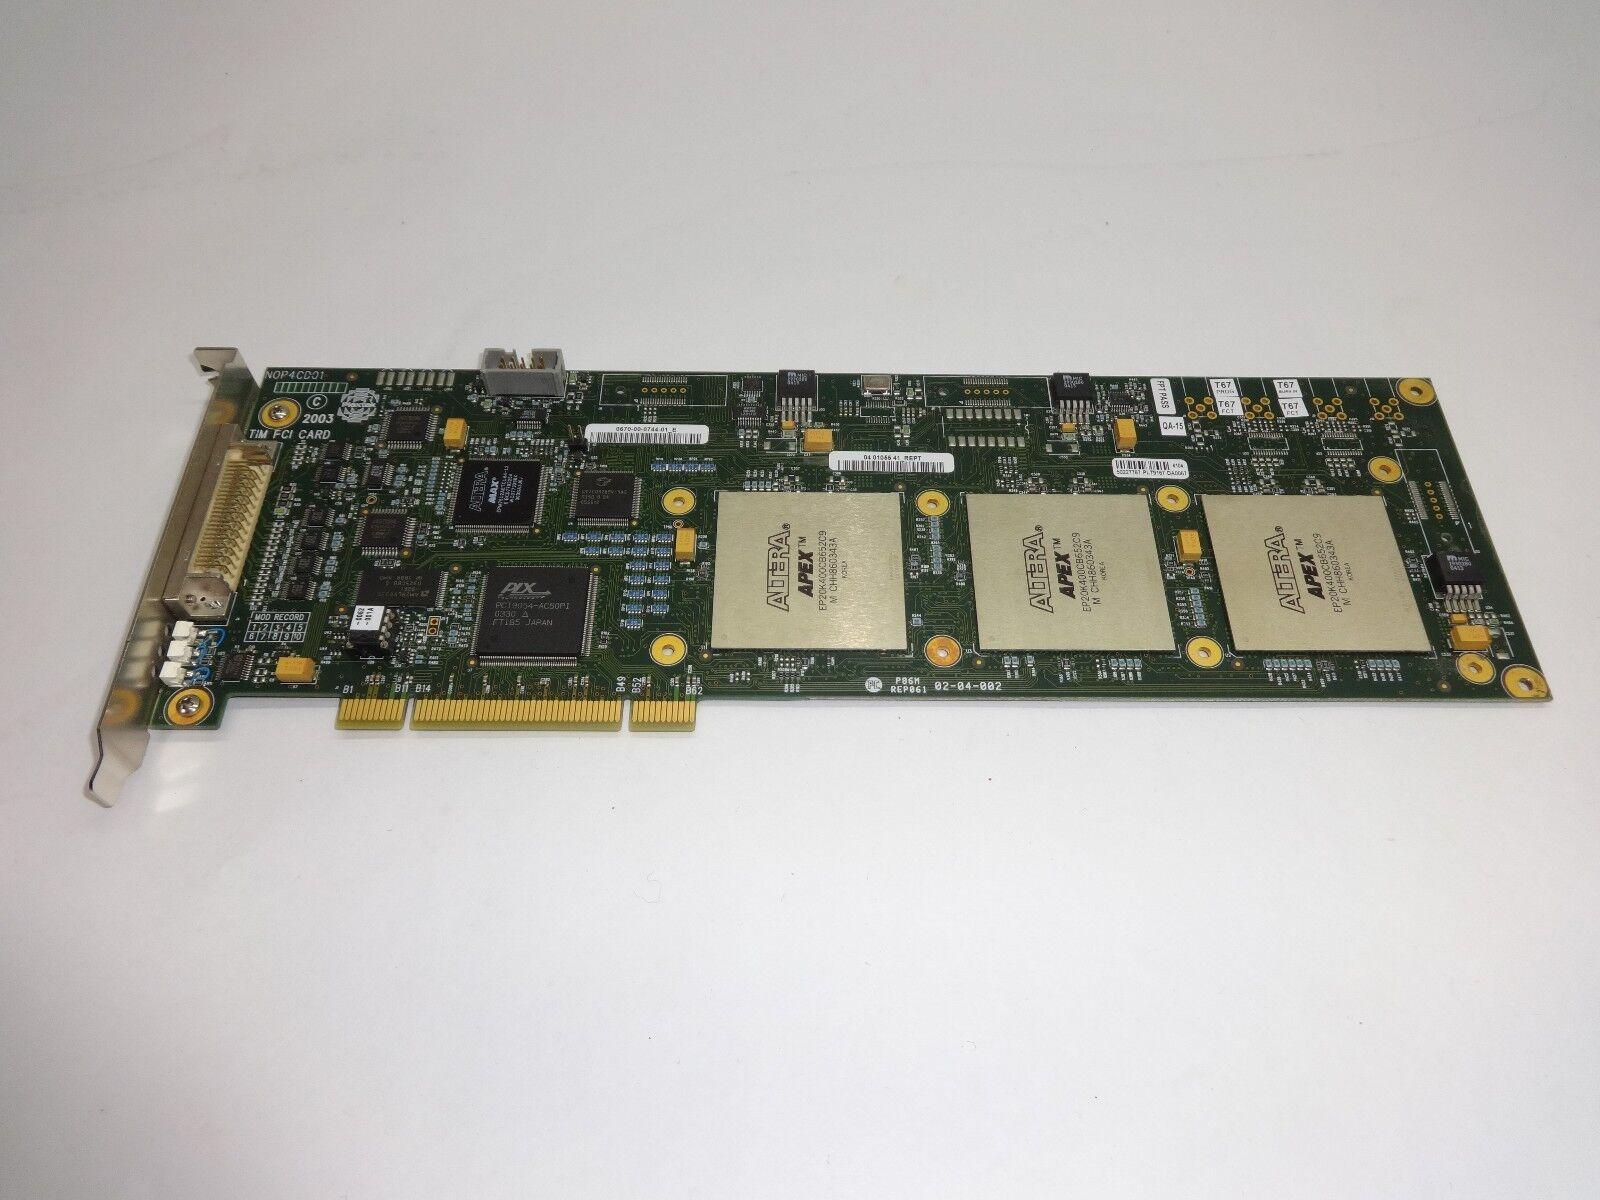 Plextek PCI SCSI Adapter N0P4CD01 TIM PCI Card